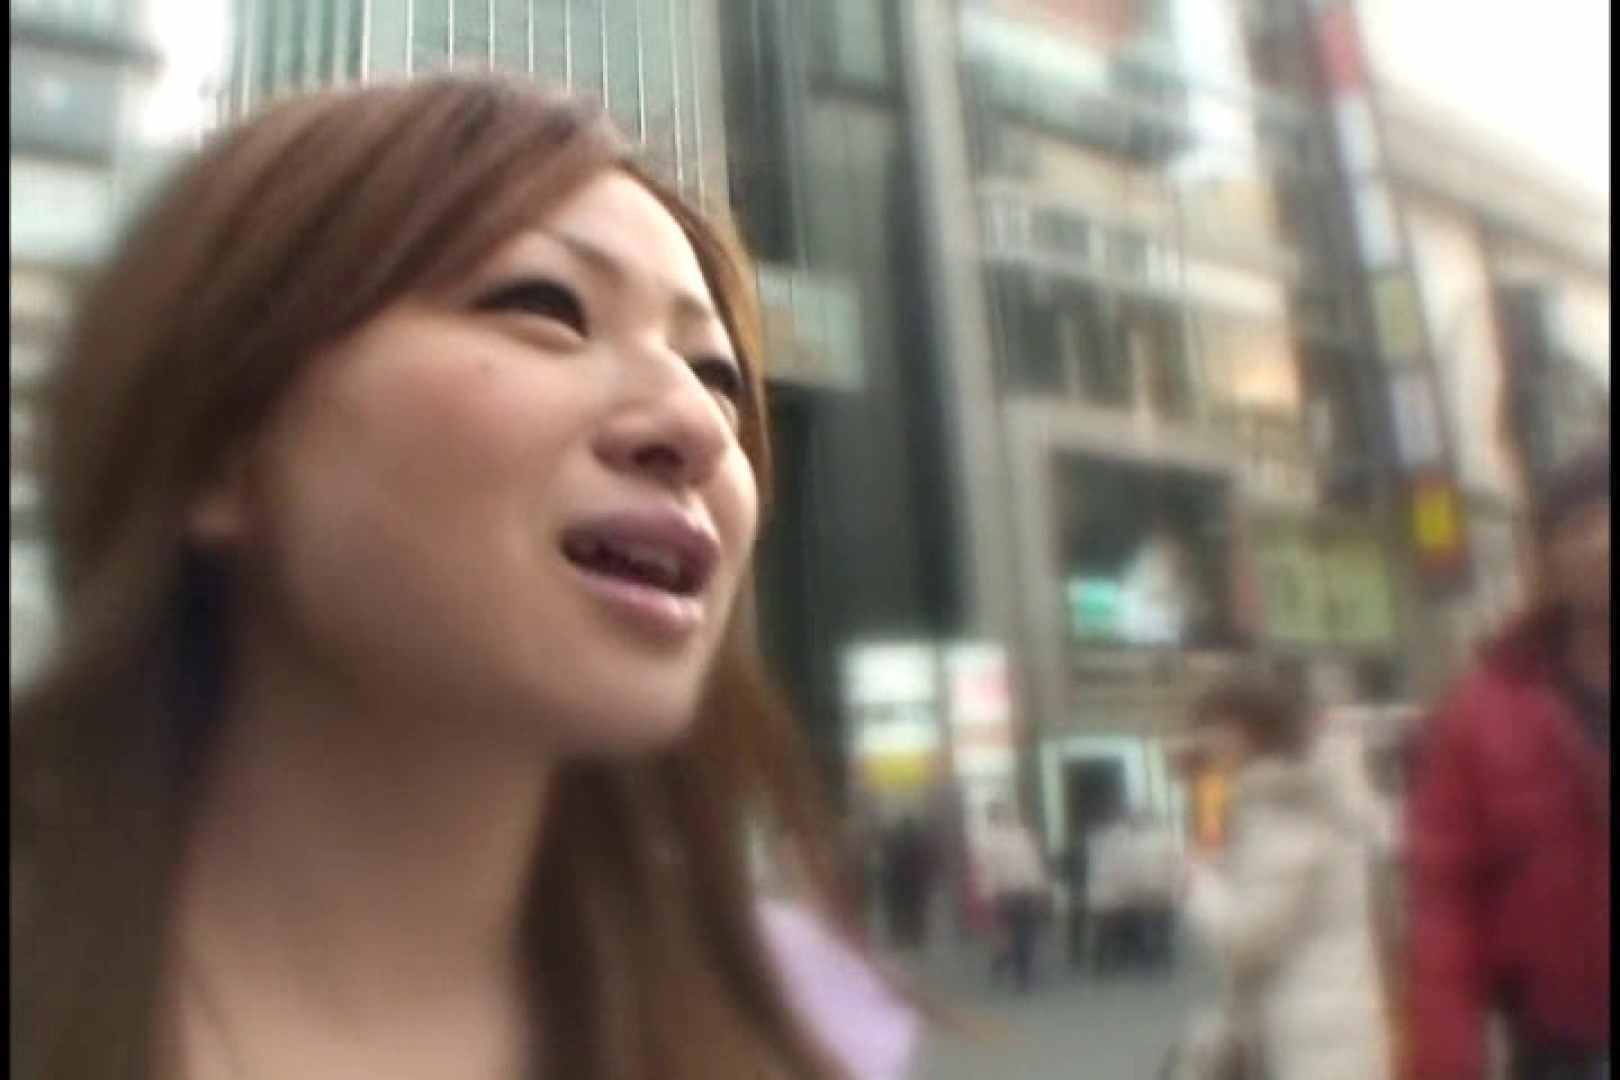 JDハンター全国ツアー vol.015 前編 女子大生のエロ生活  18連発 10